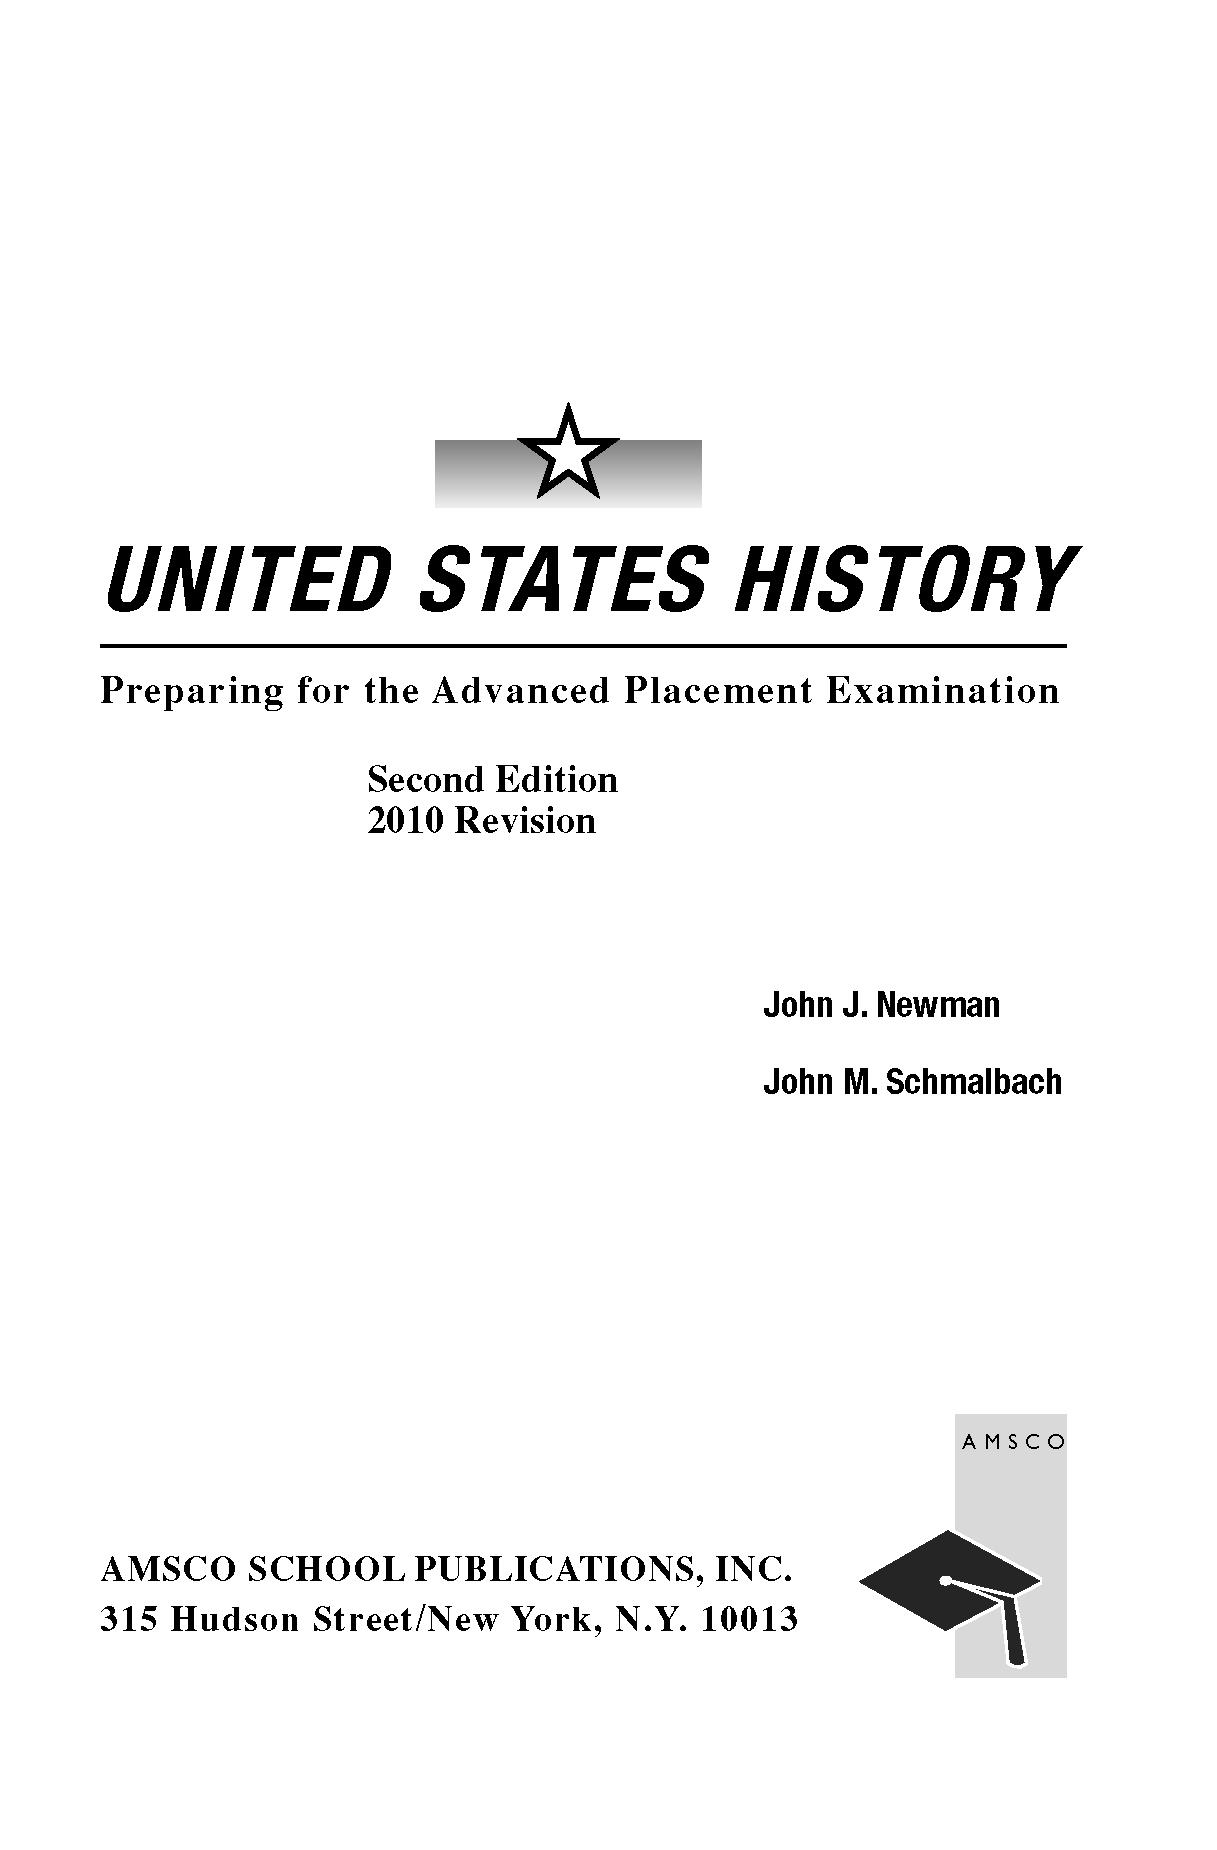 历年国际ap united states history课程教材课本